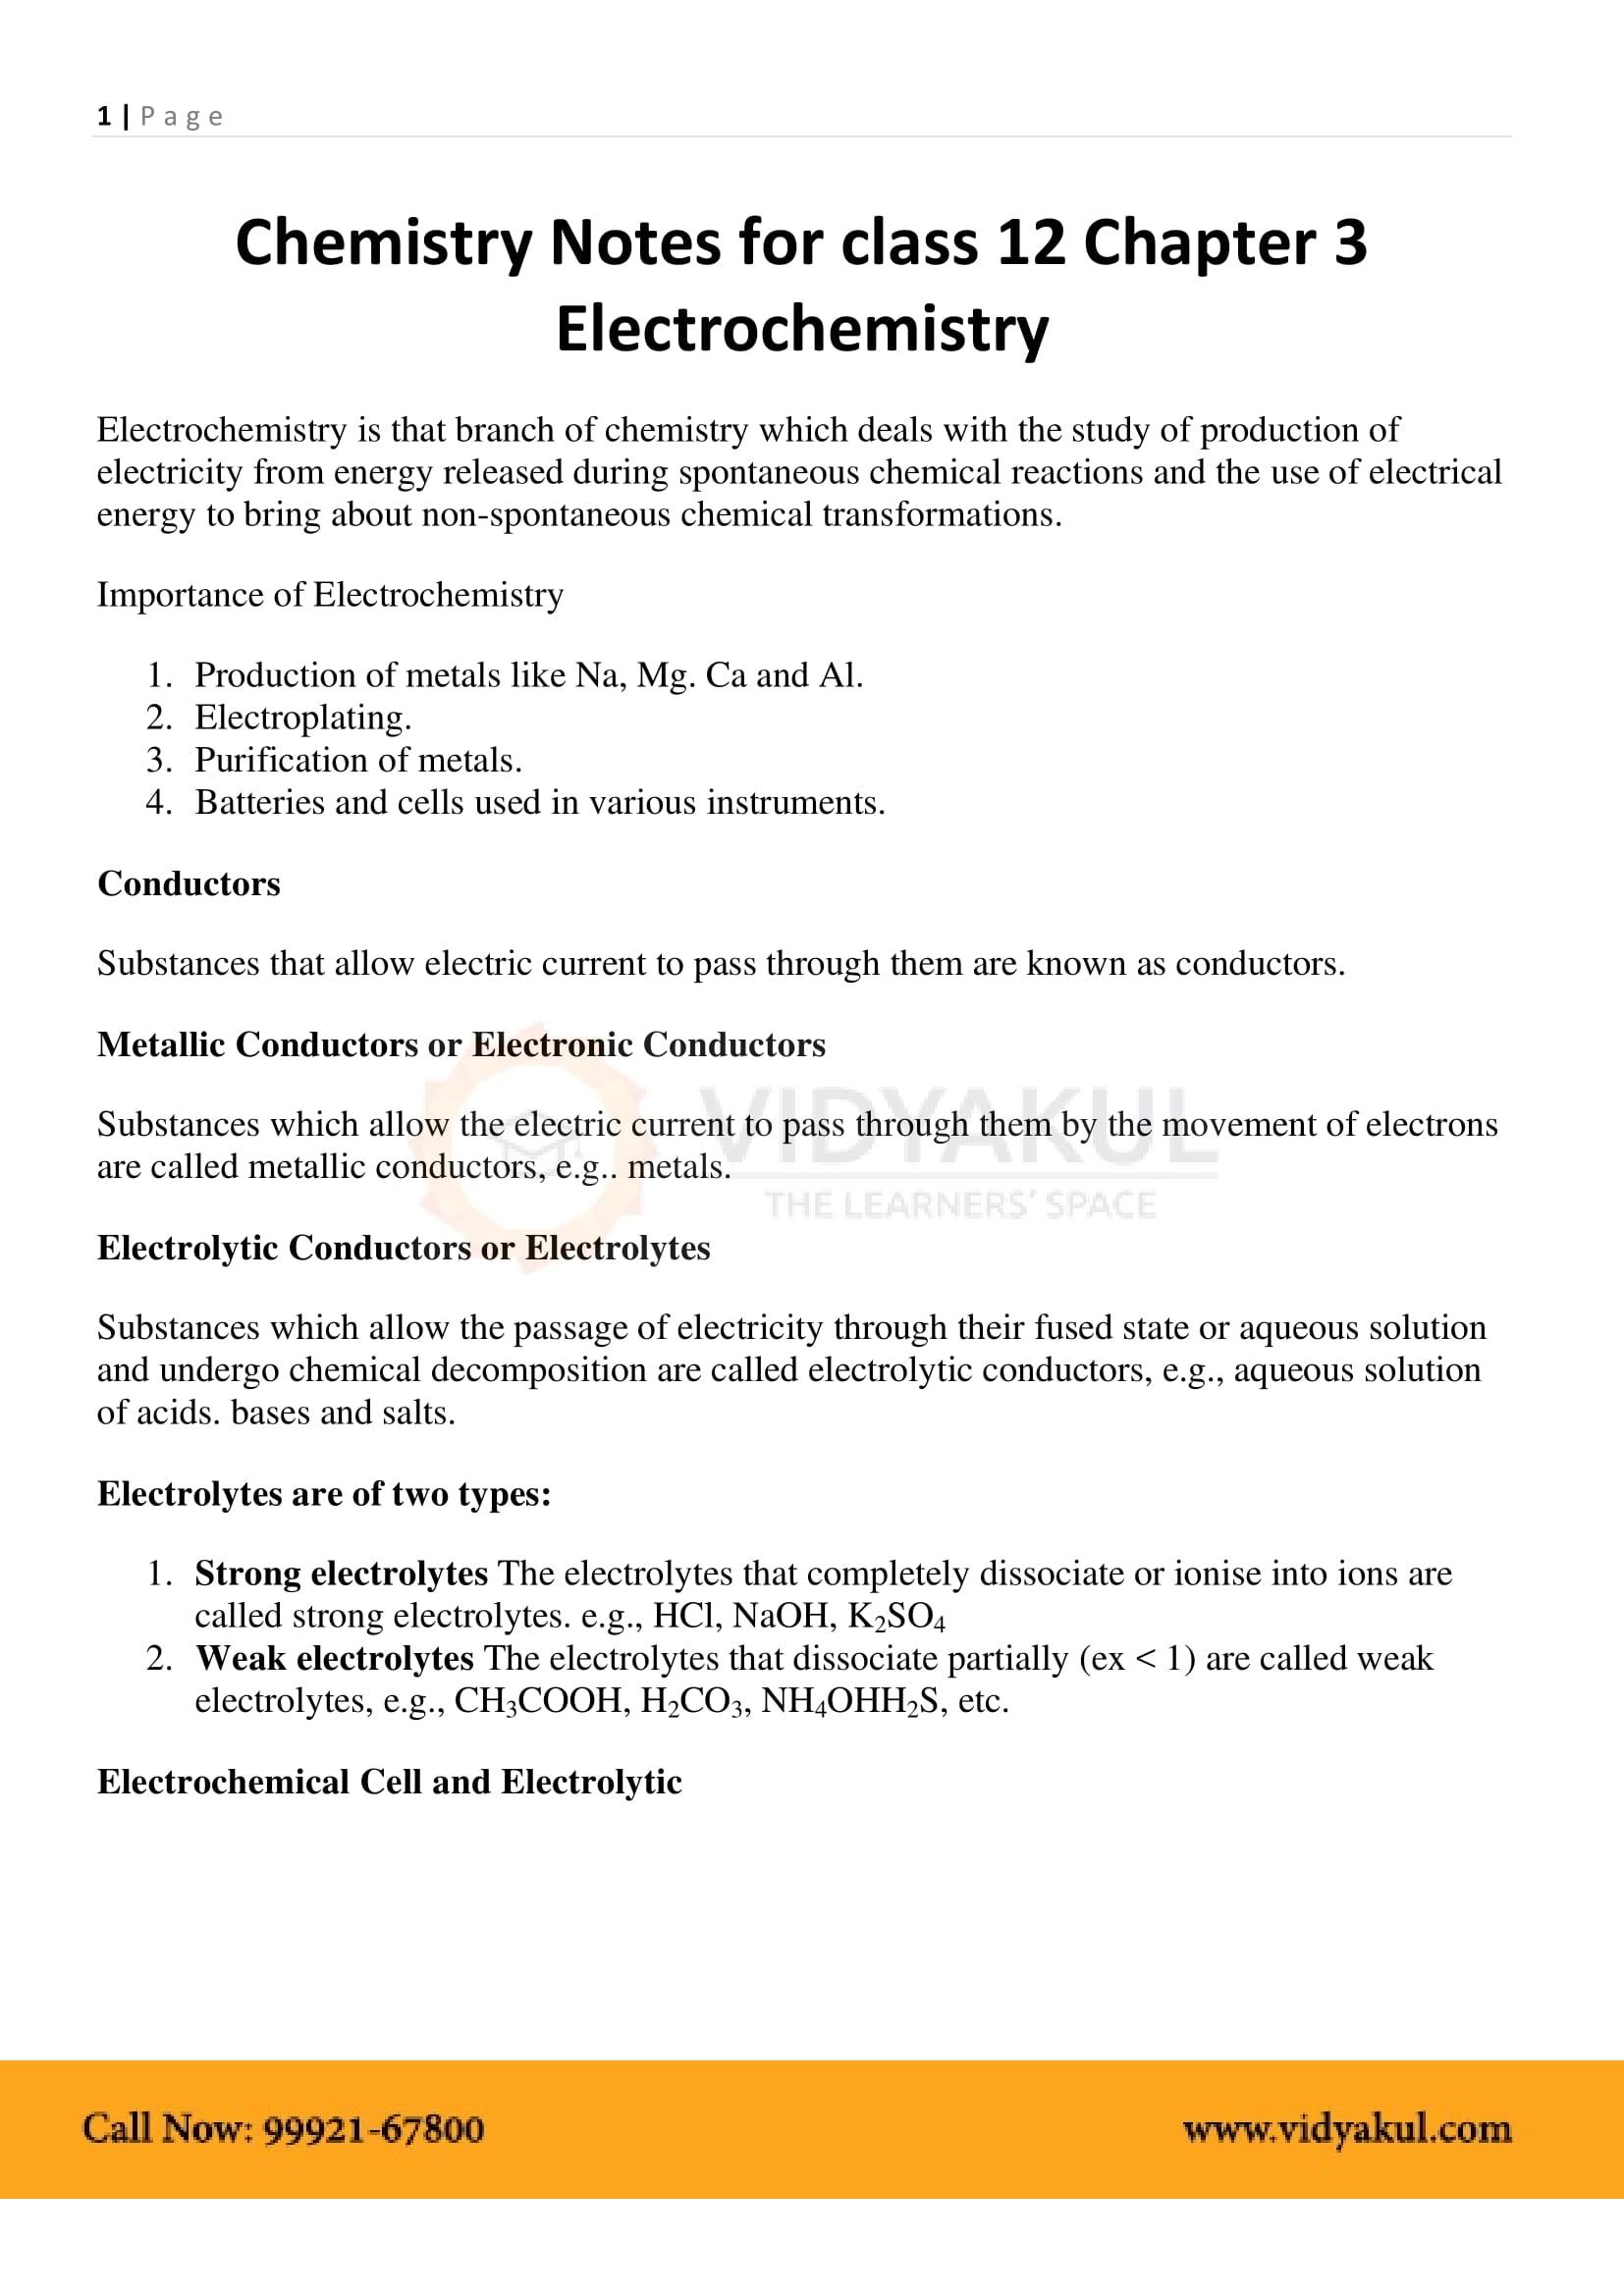 💄 Chemistry class 12 notes pdf punjab board | 12th Class Chemistry